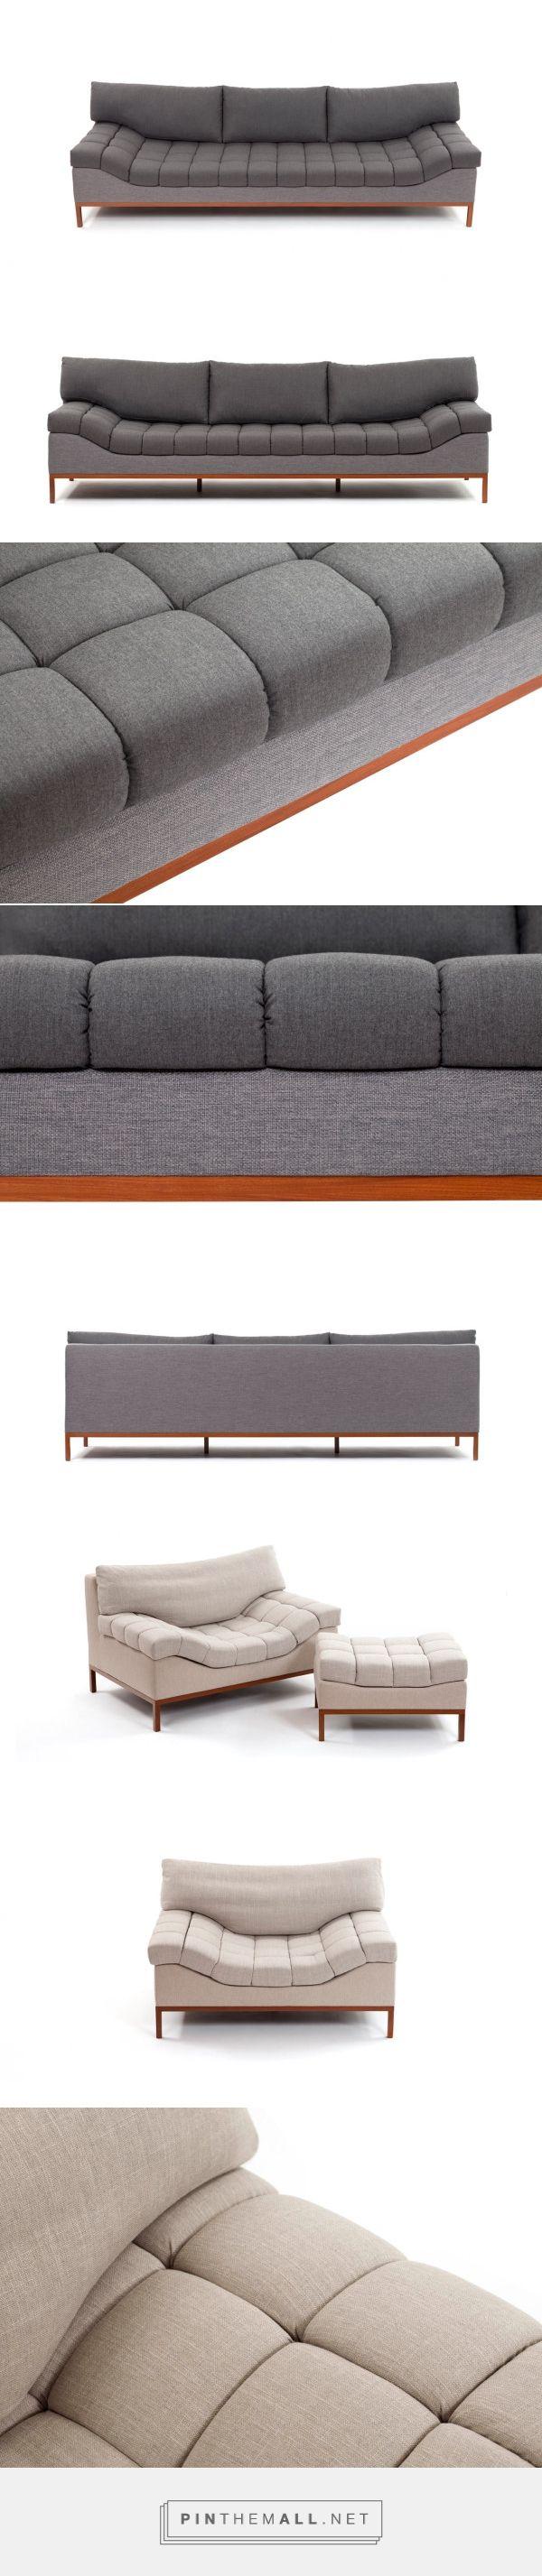 A Cloud-Inspired Sofa and Armchair - Design Milk - created via http://pinthemall.net